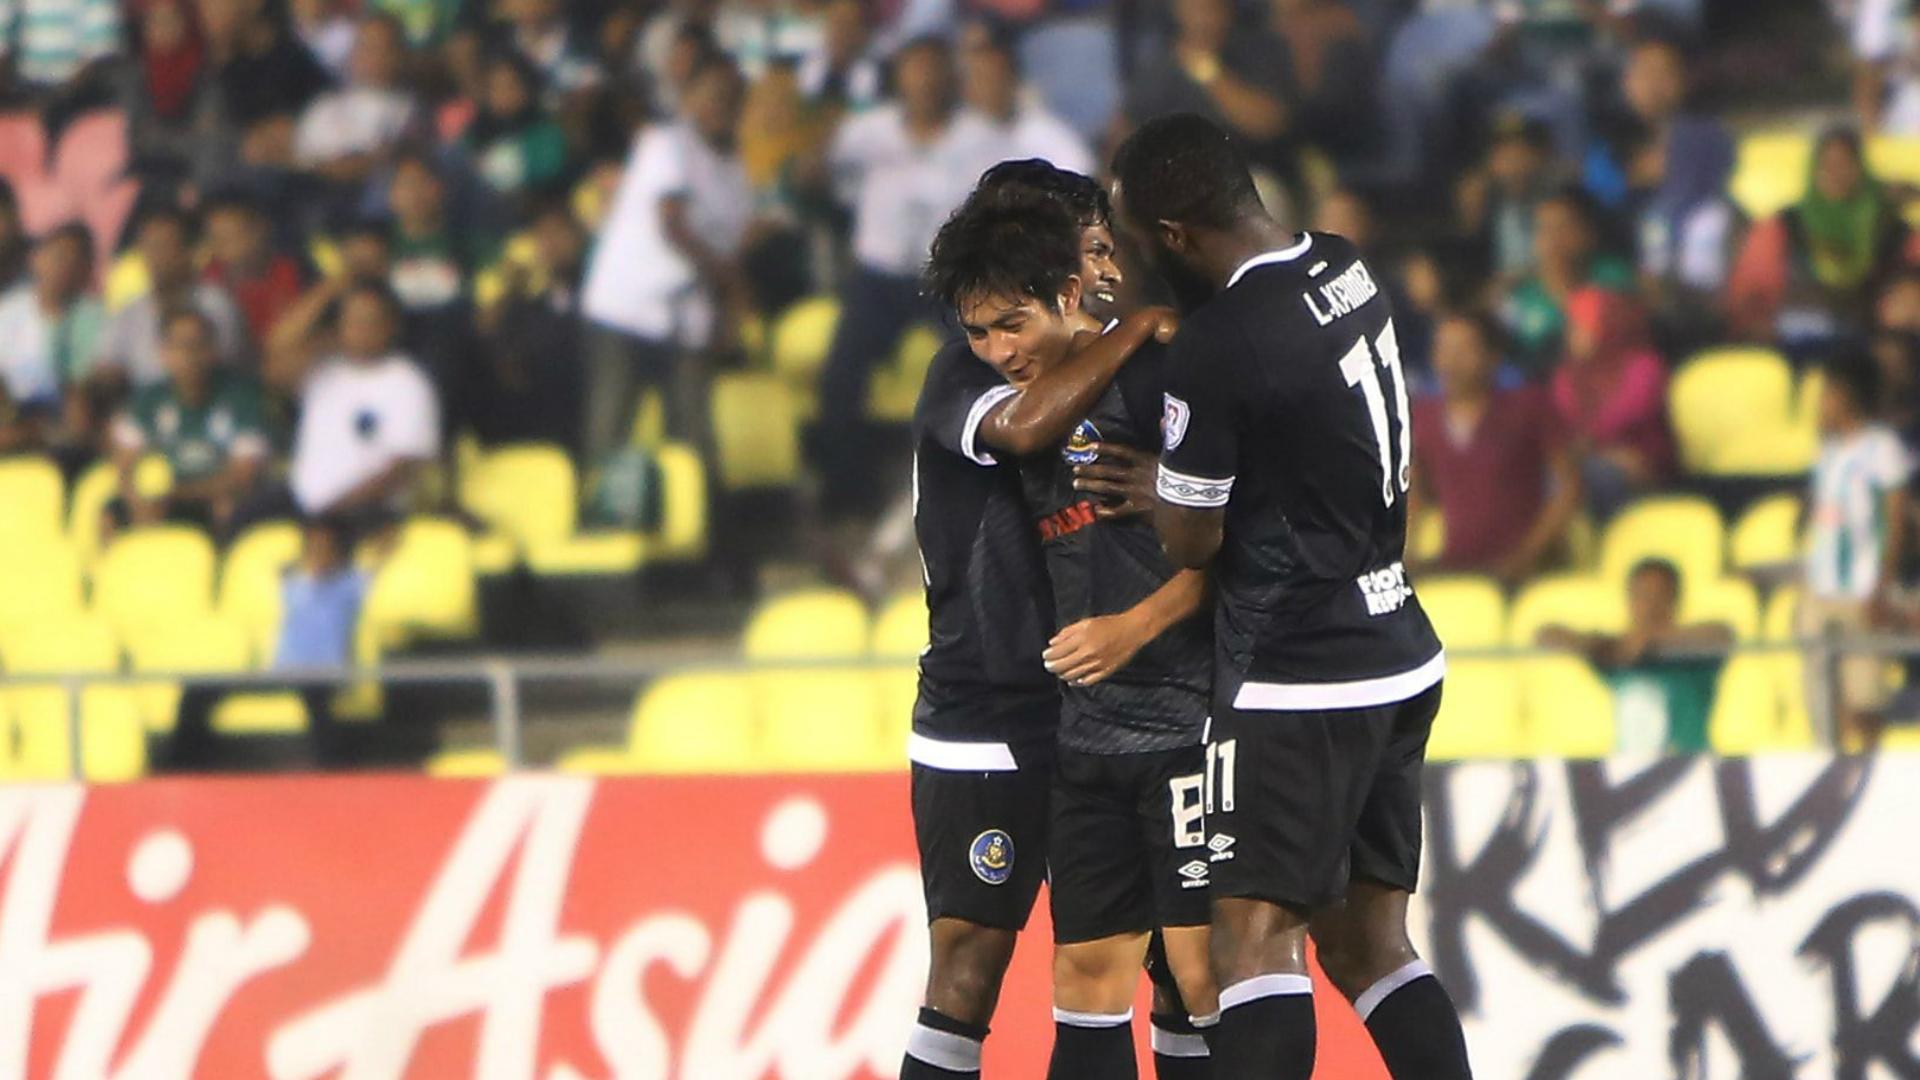 Wan Zaharulnizam, Melaka v Pahang, Malaysia Cup, 22 Sep 2019